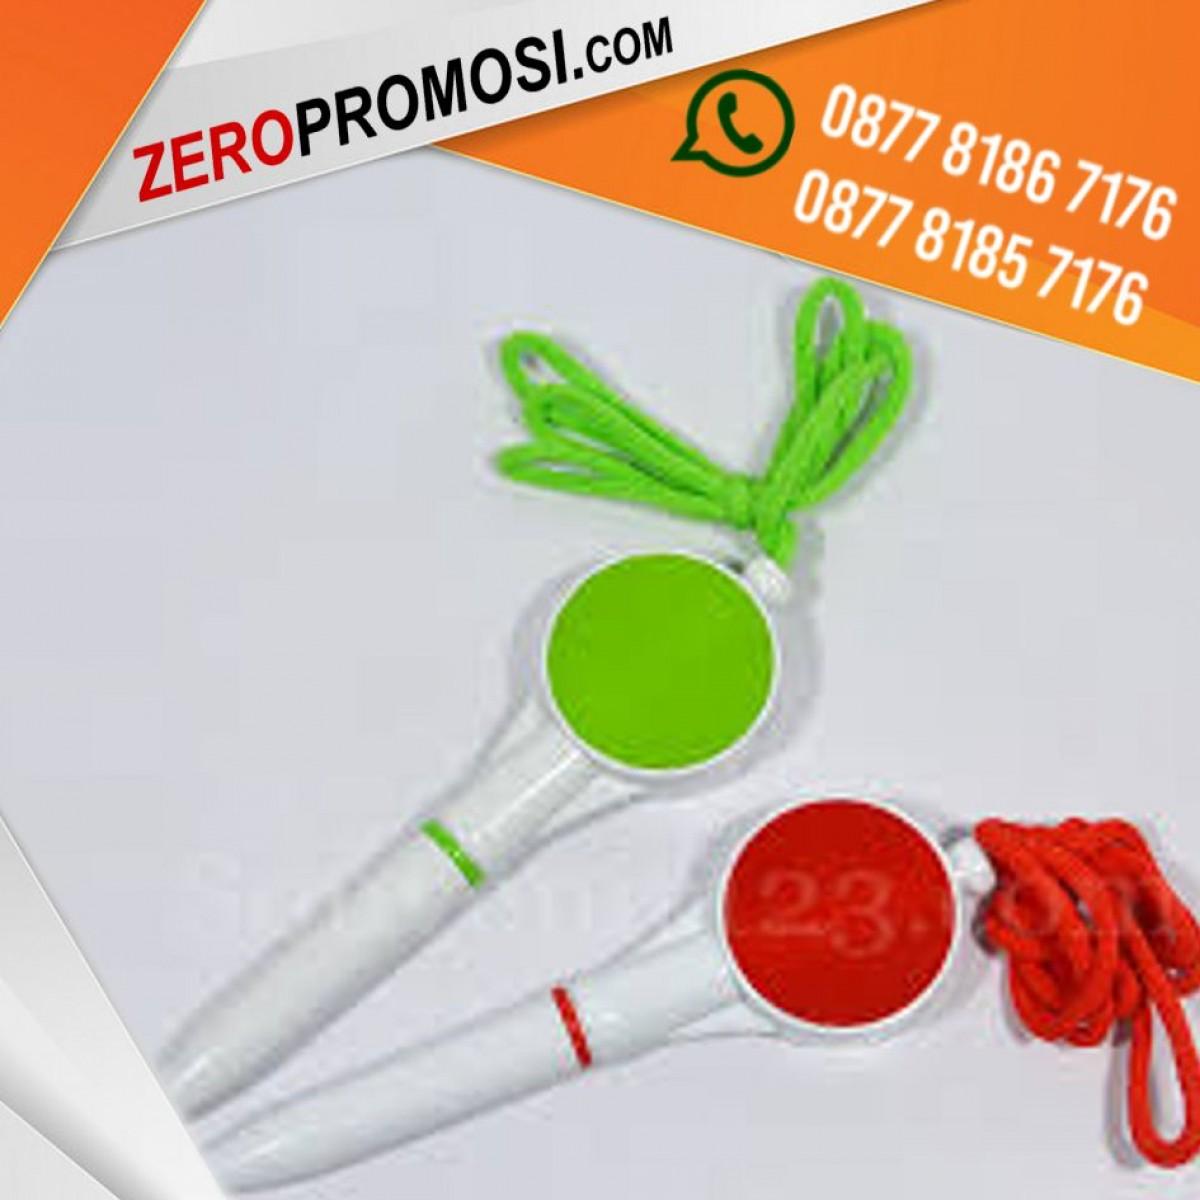 Souvenir Pulpen Raket - Promosi Pen Gendang